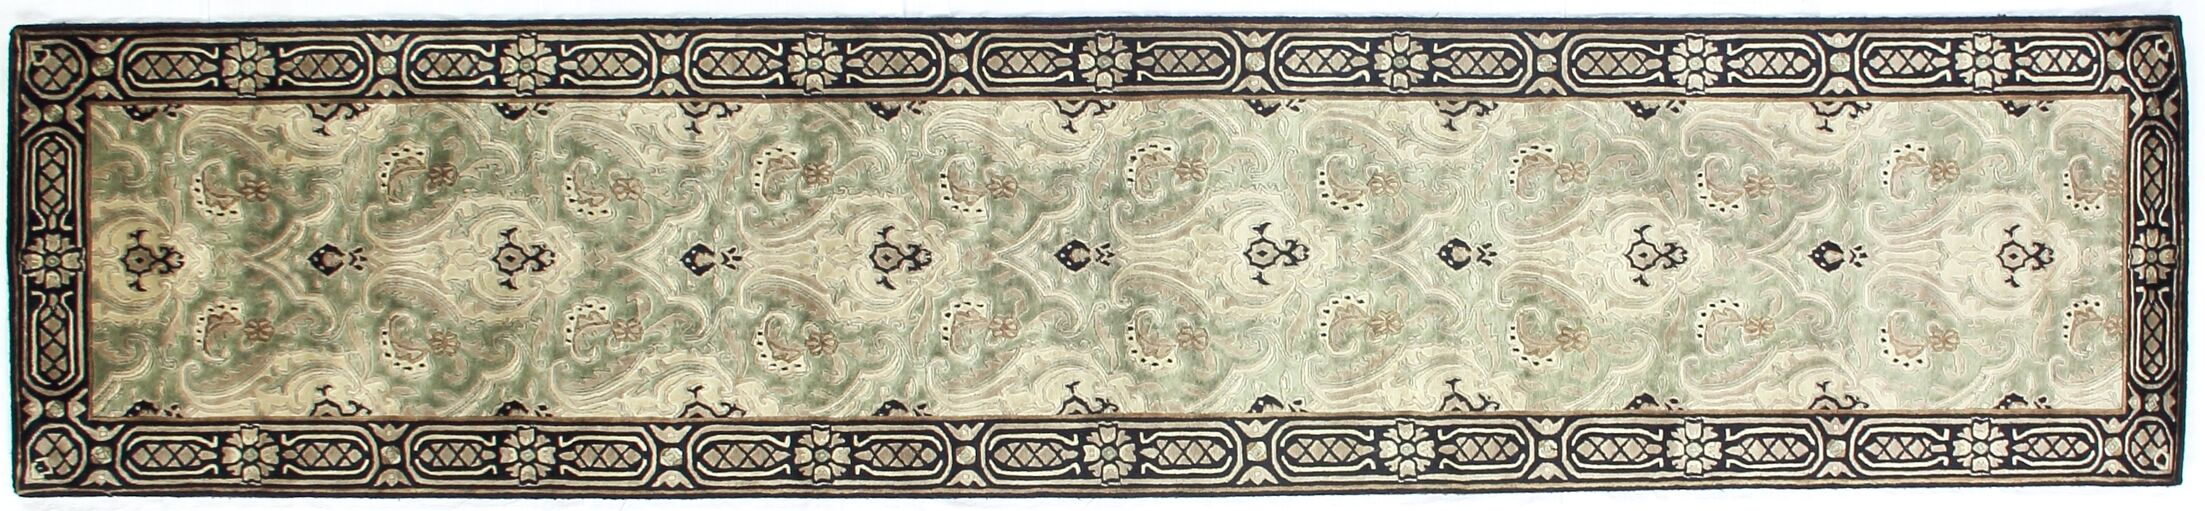 Tibetan Weave Hand-Knotted Wool Gray/Beige Area Rug